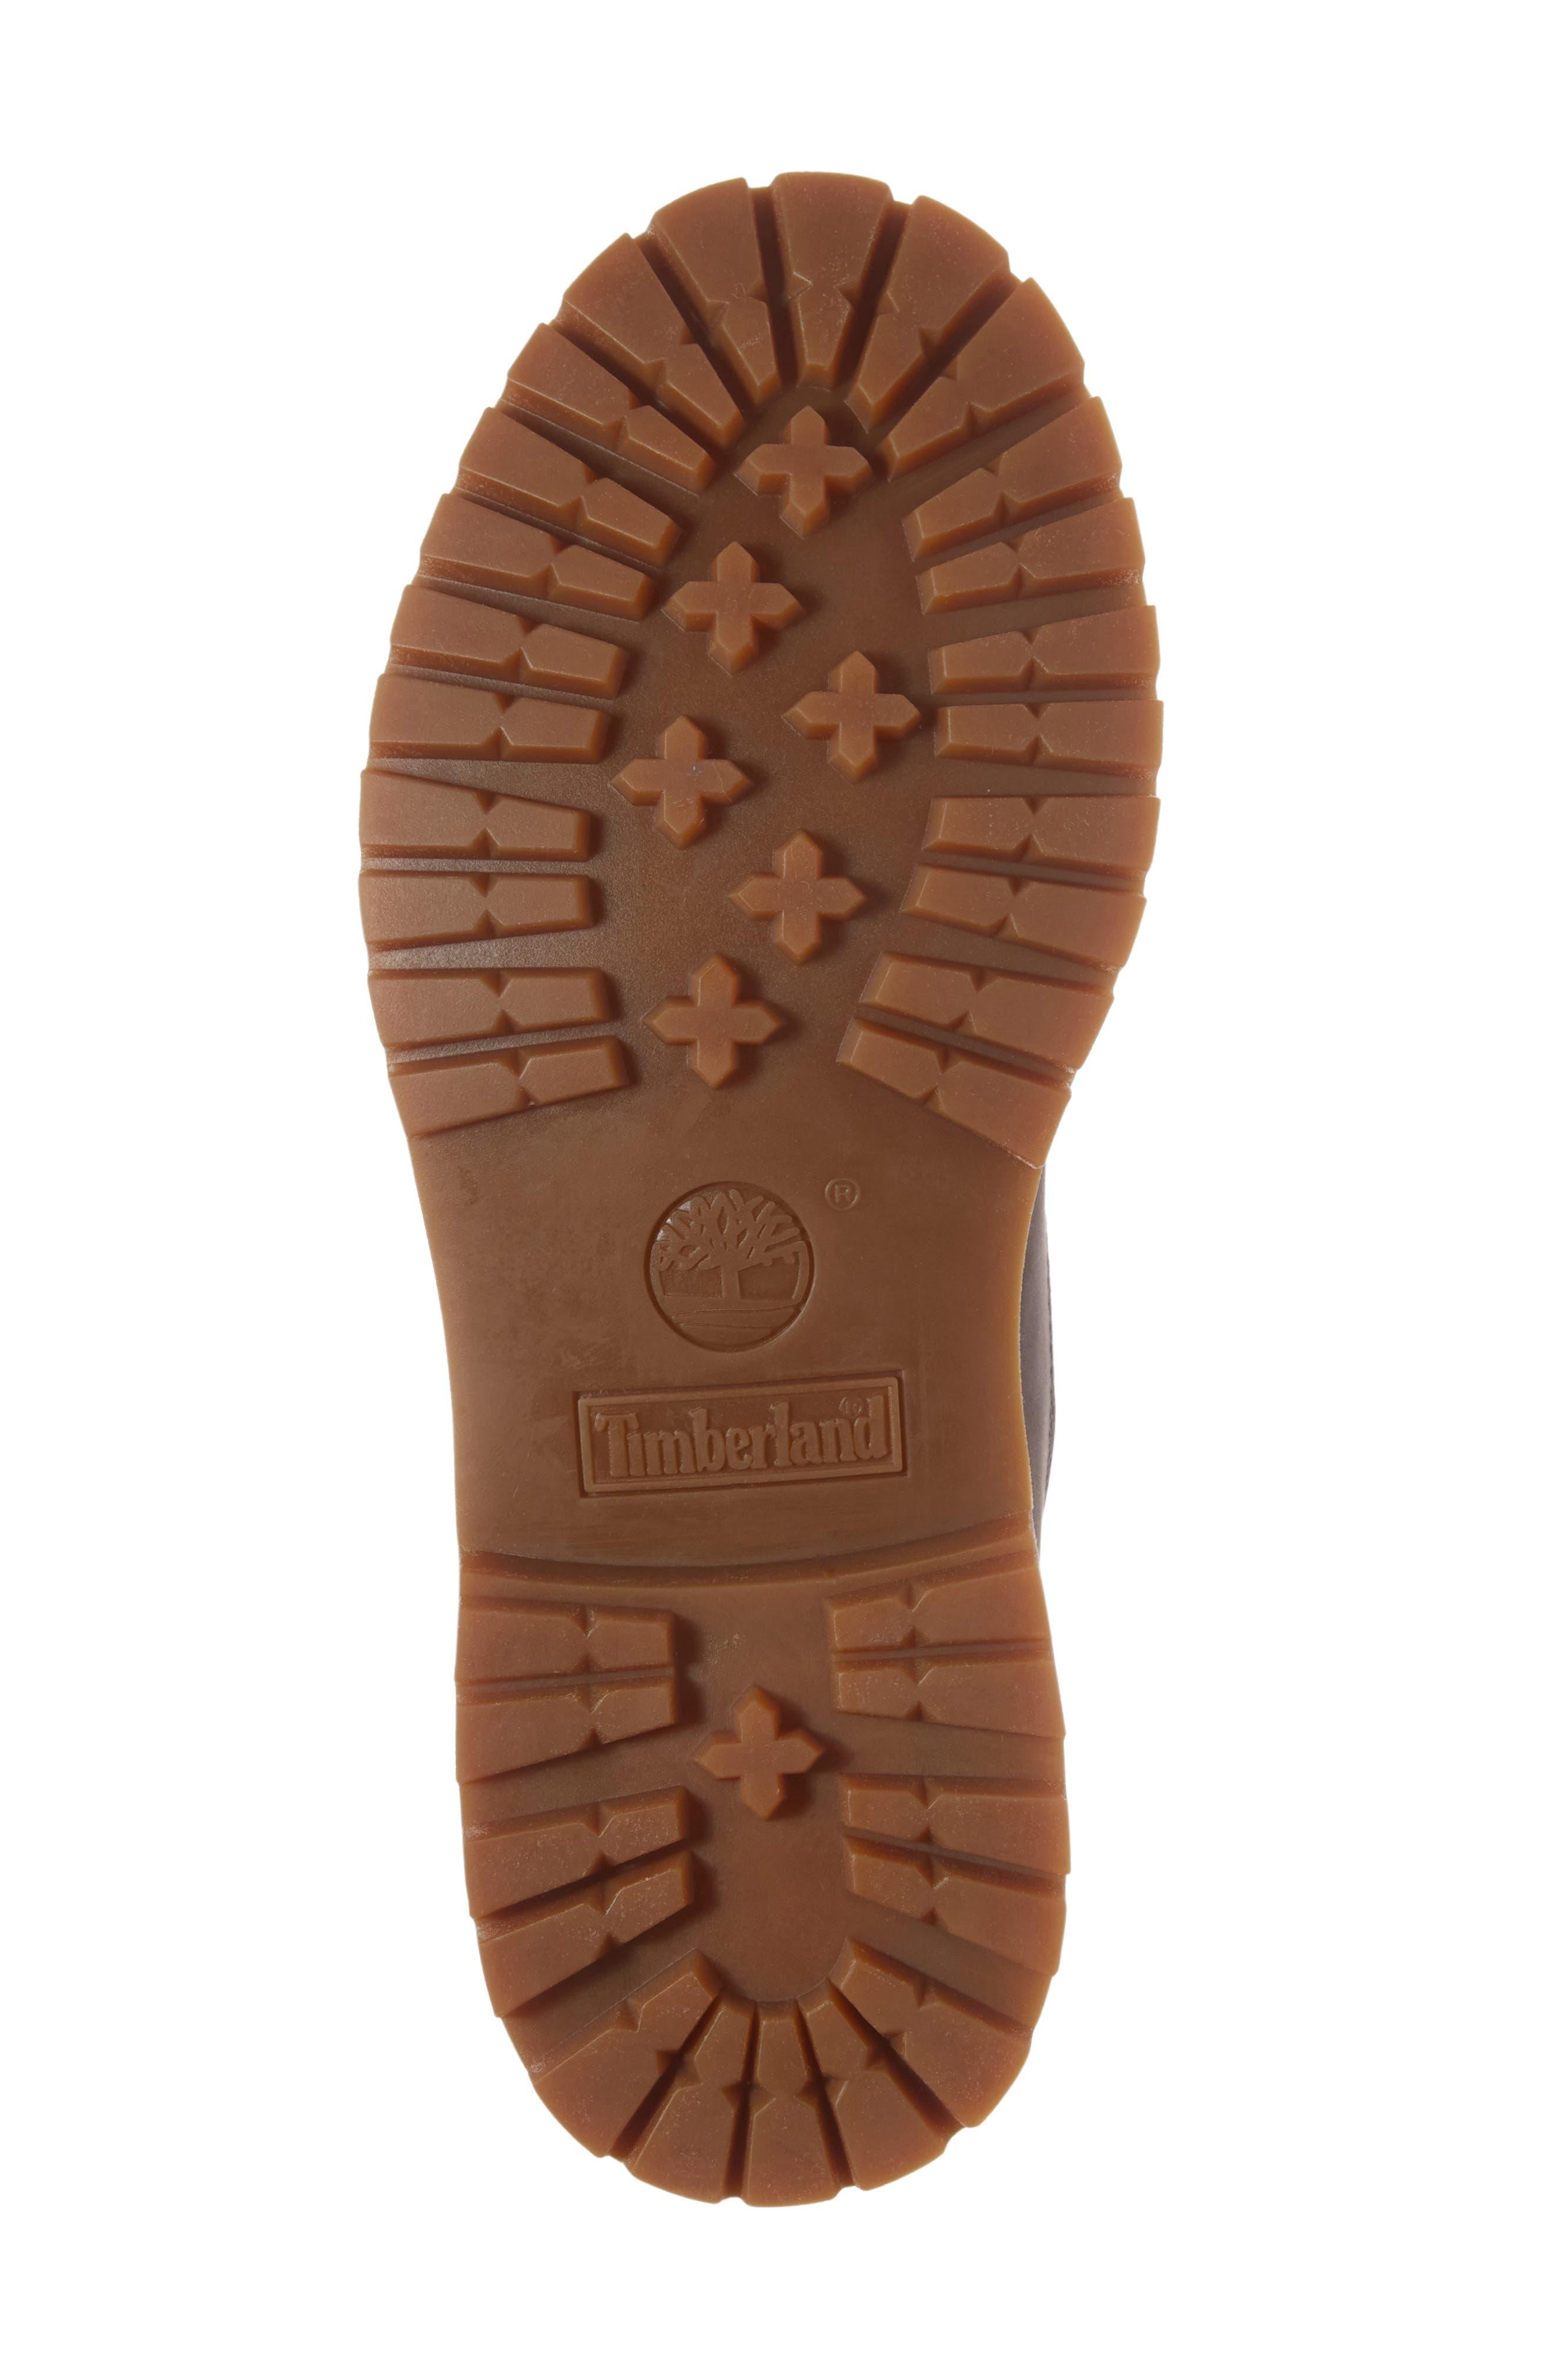 6-Inch Premium Embossed Waterproof Boot,                             Alternate thumbnail 6, color,                             Eiffel Tower Nubuck